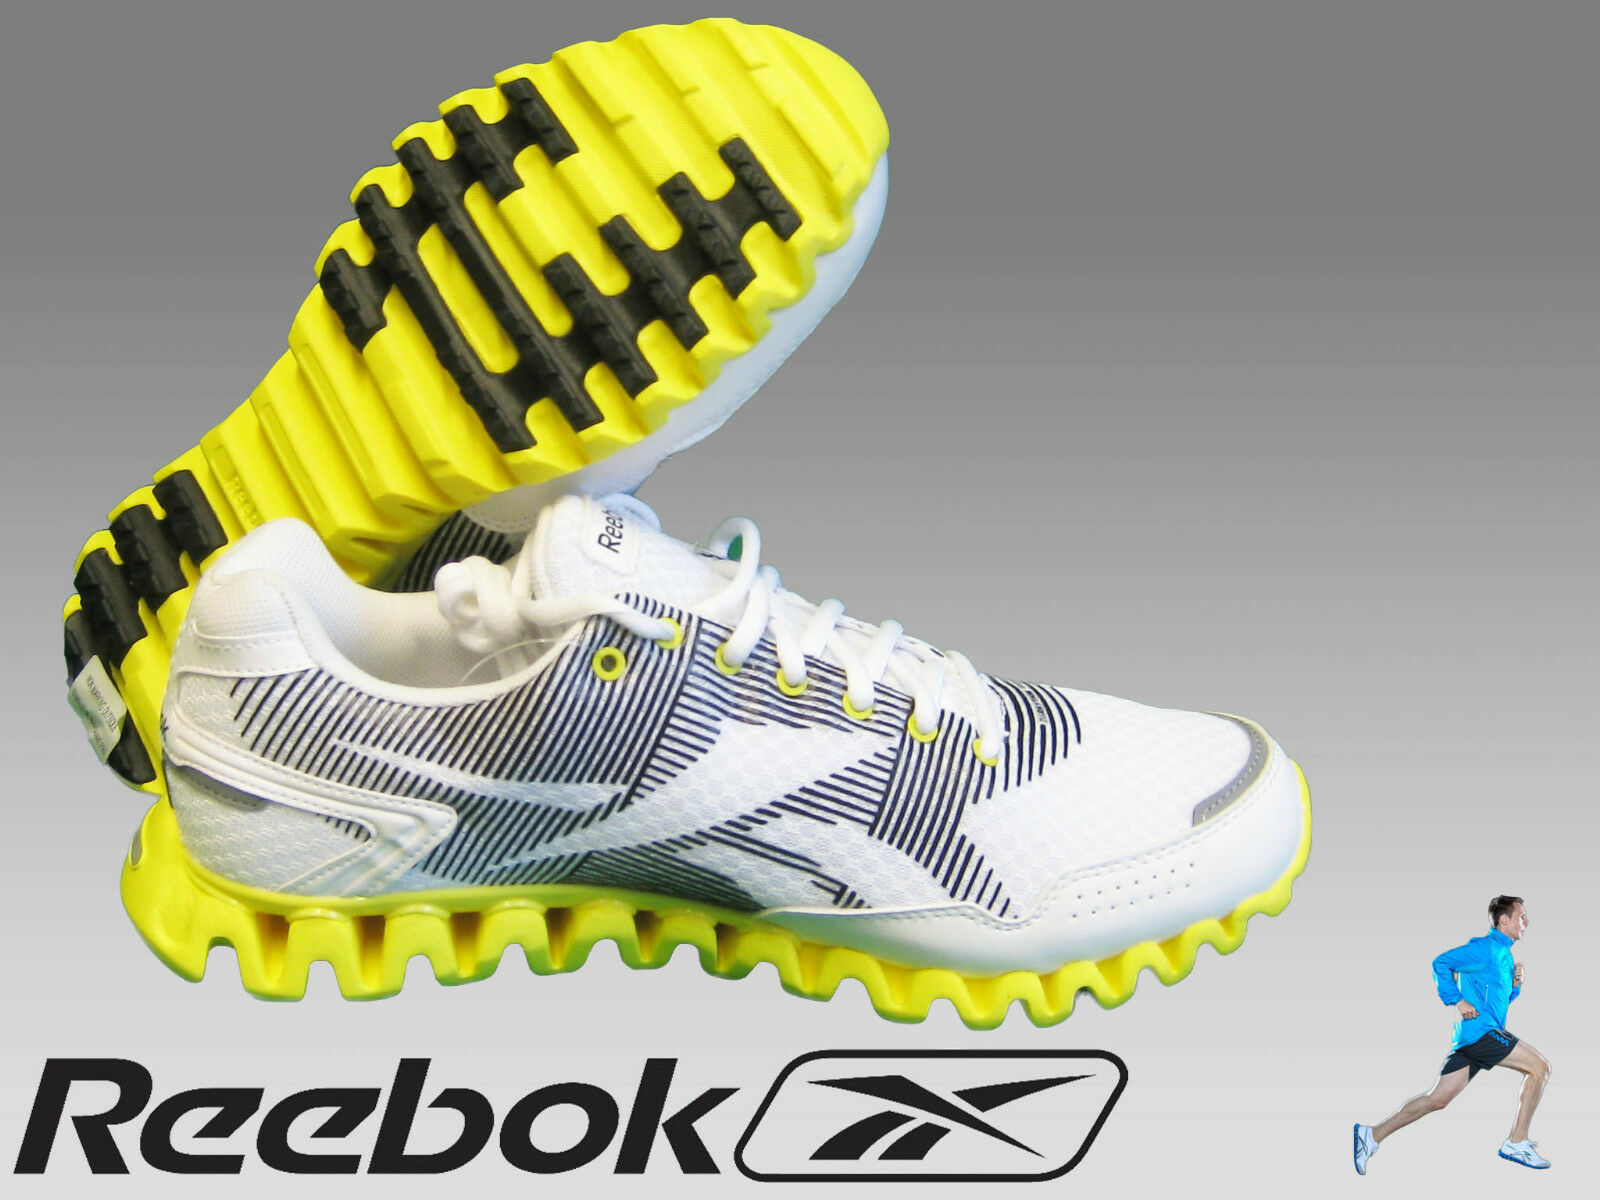 New REEBOK  ZIGNANO RYTHM  RUNNING SHOES Mens Running Running Running Trainers UK 7.5  EU 41 23dc9f